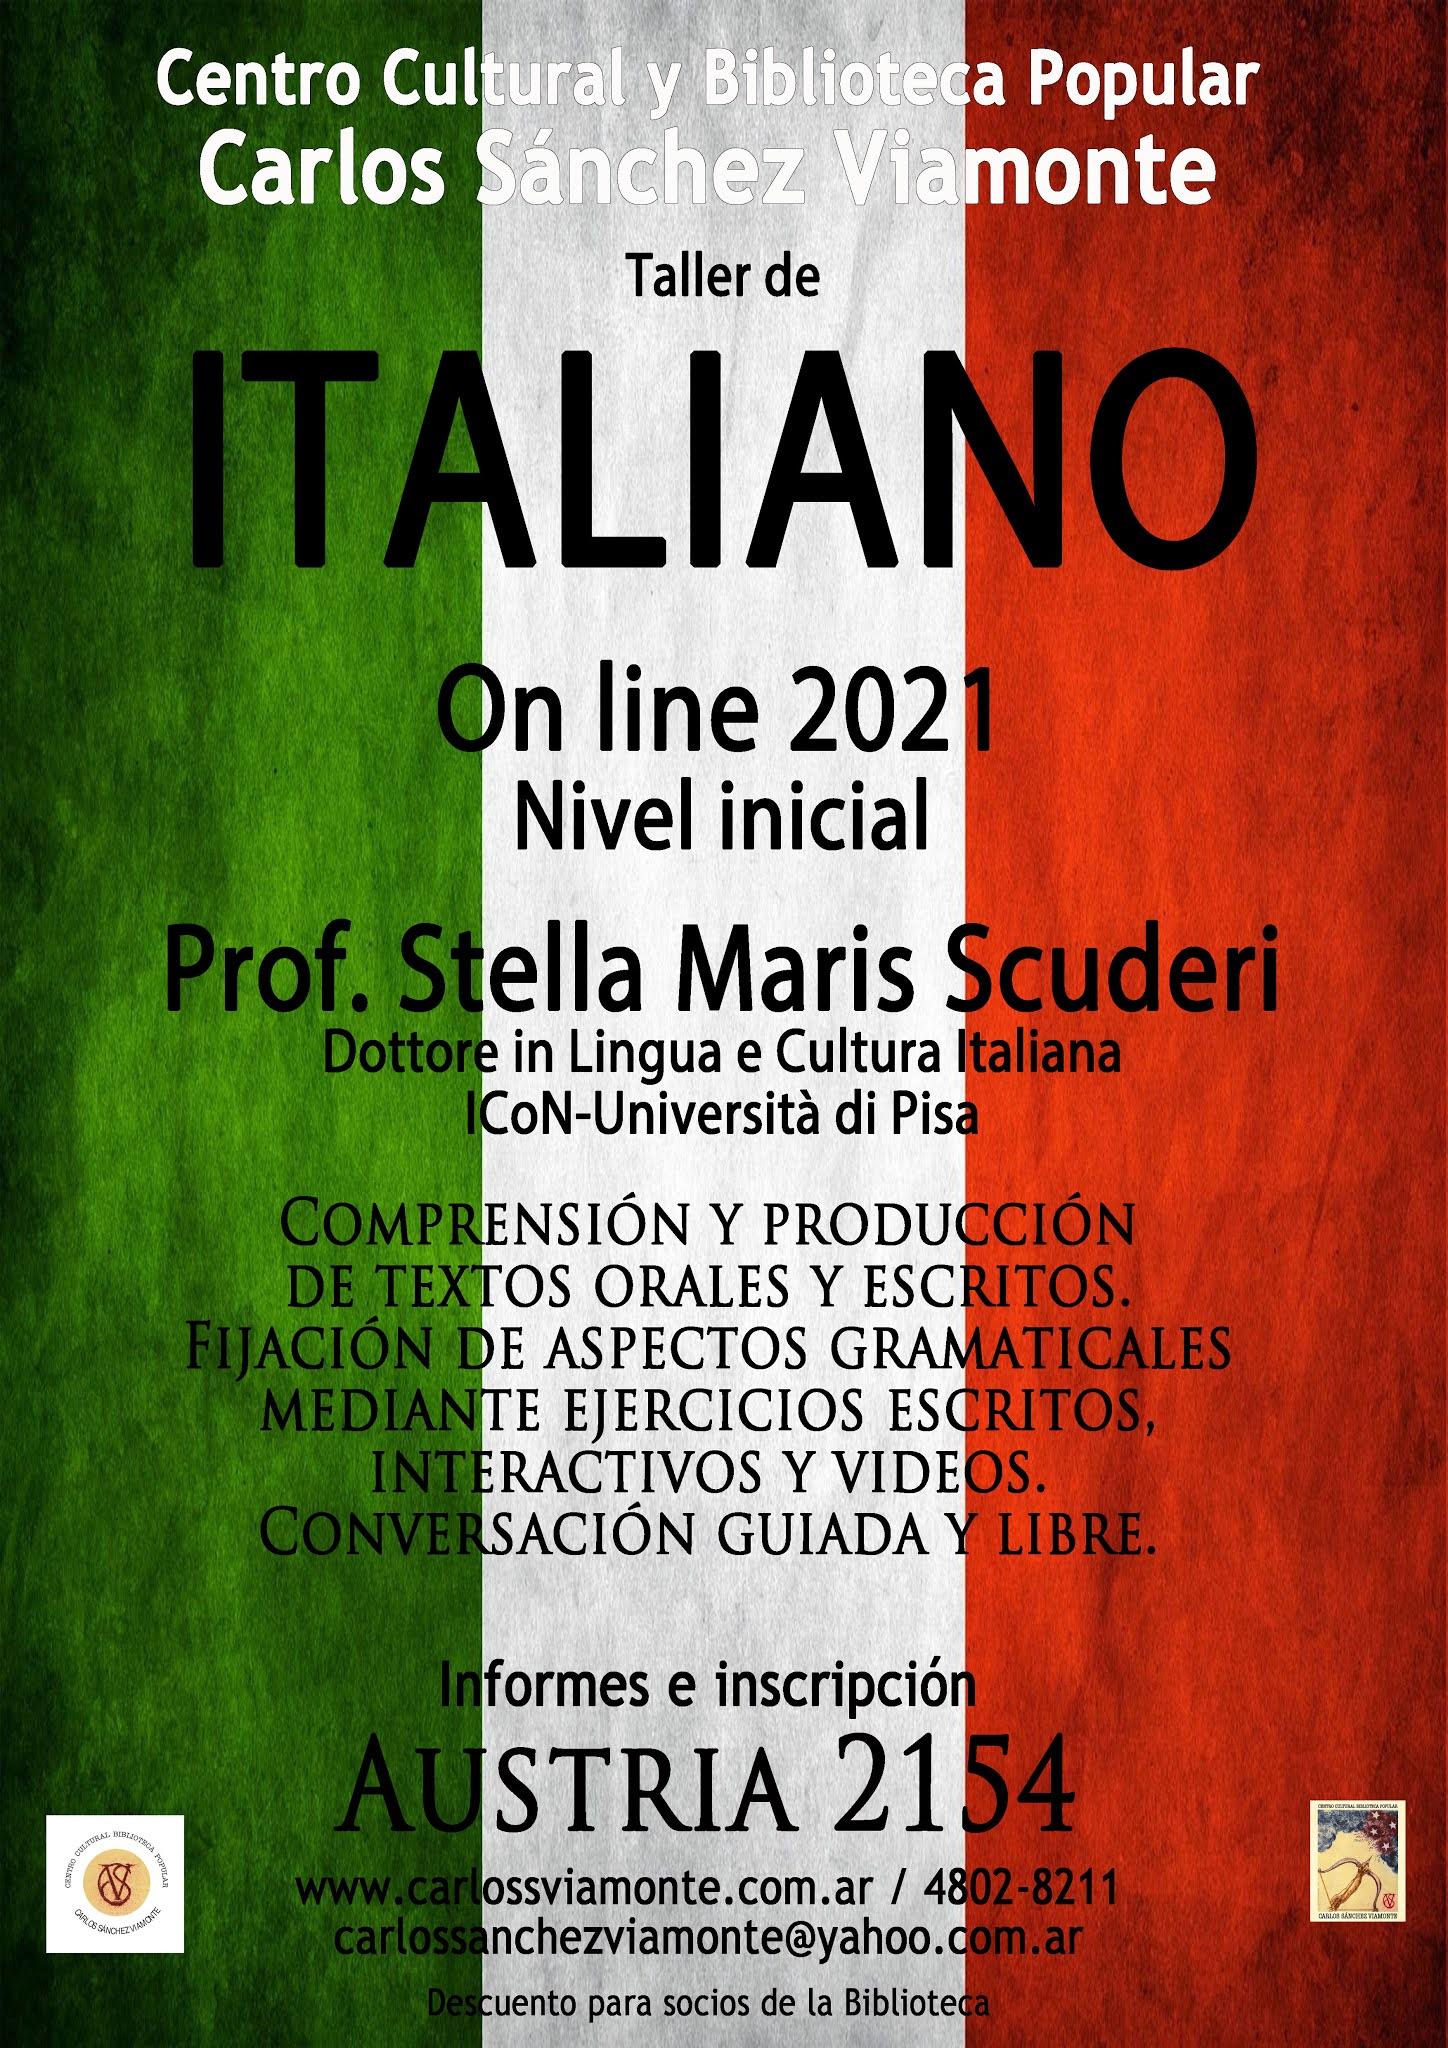 Taller de Italiano on line